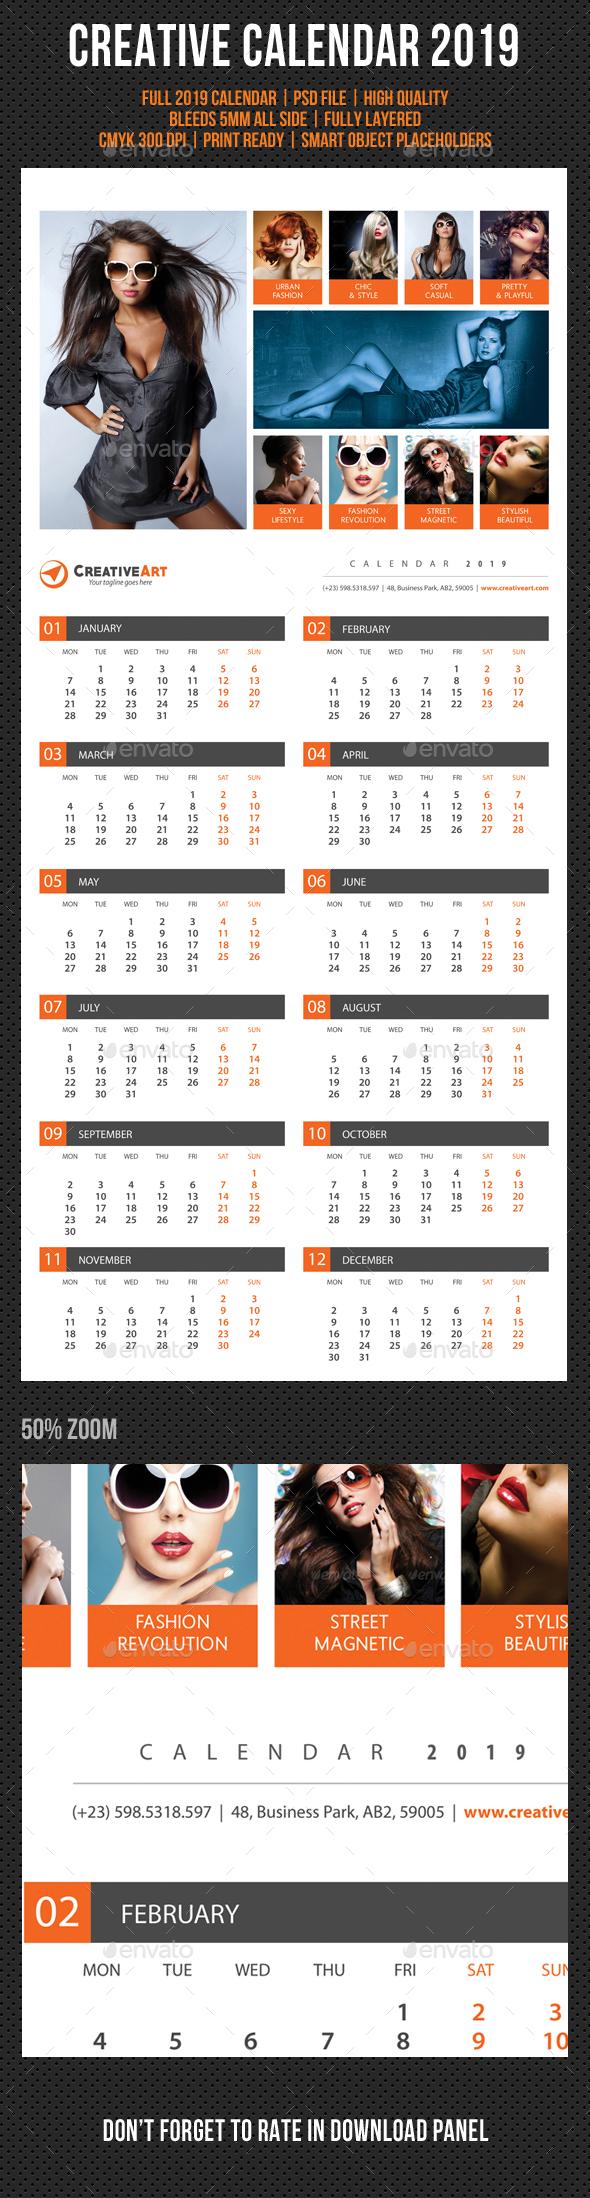 Creative Wall Calendar 2019 V02 - Calendars Stationery